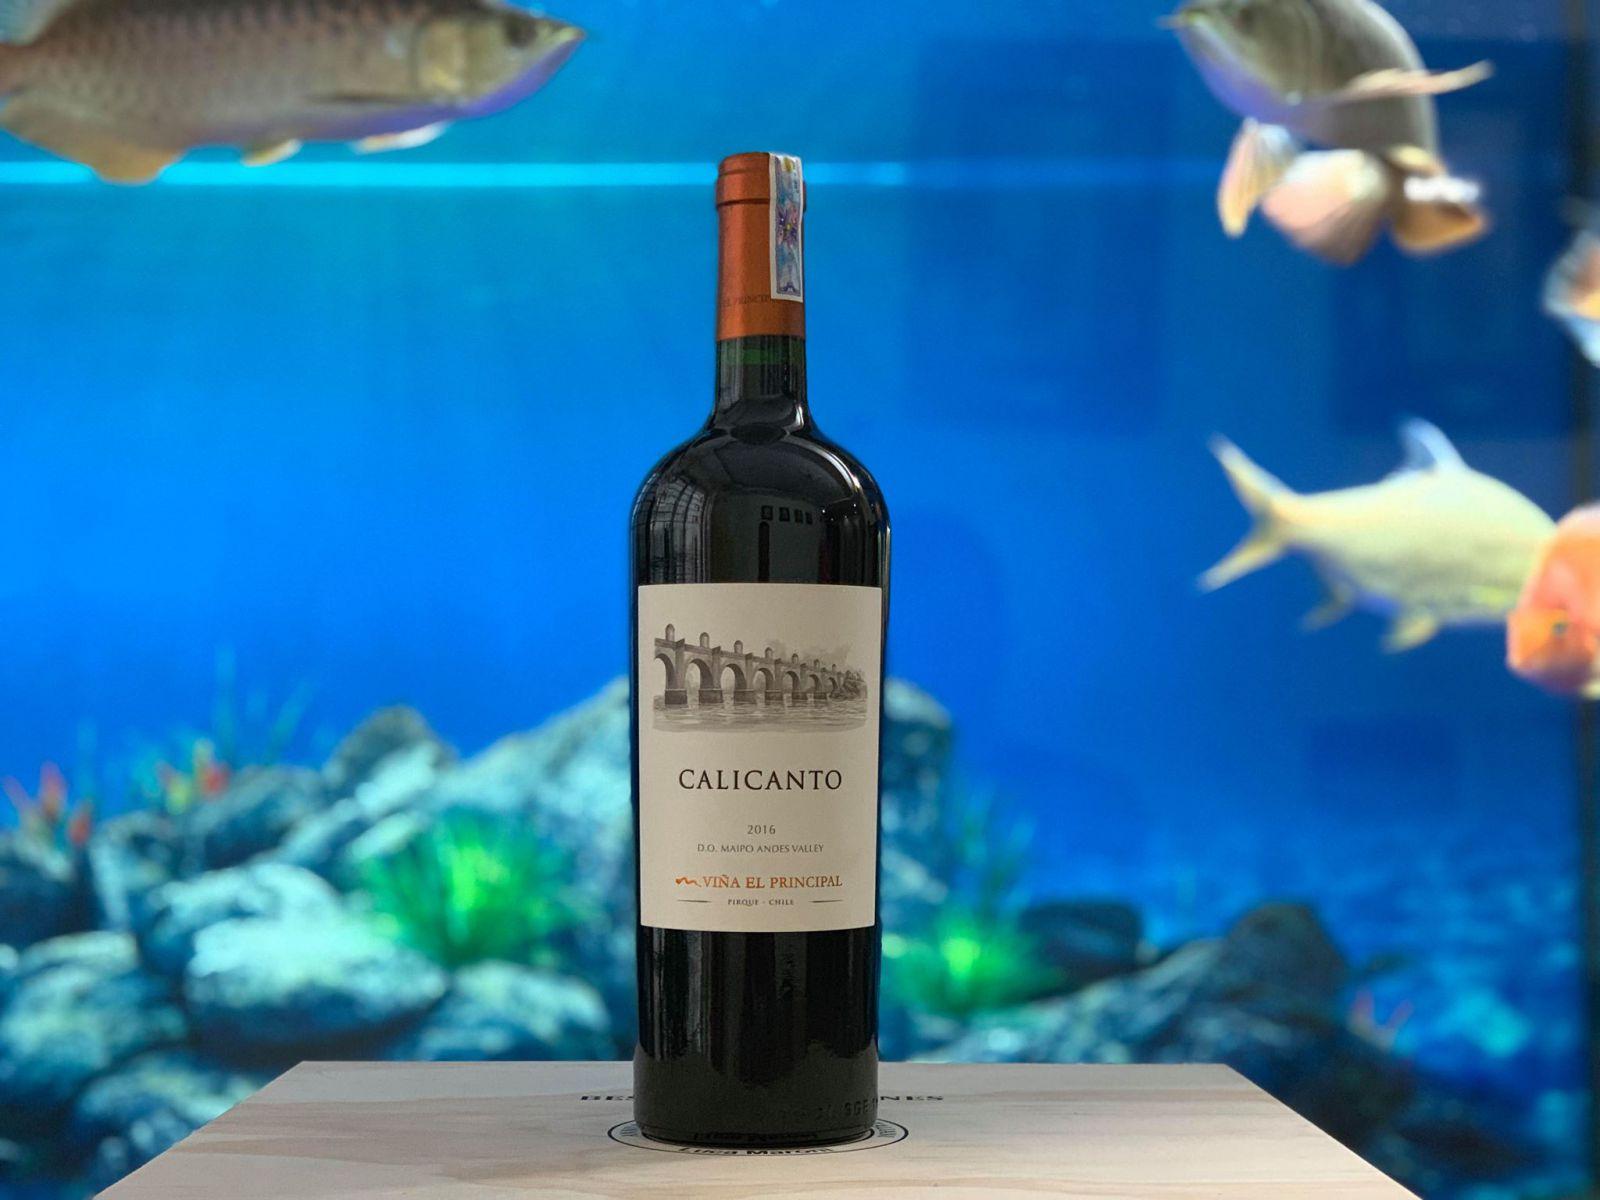 Rượu vang Chile cao cấp Calicanto